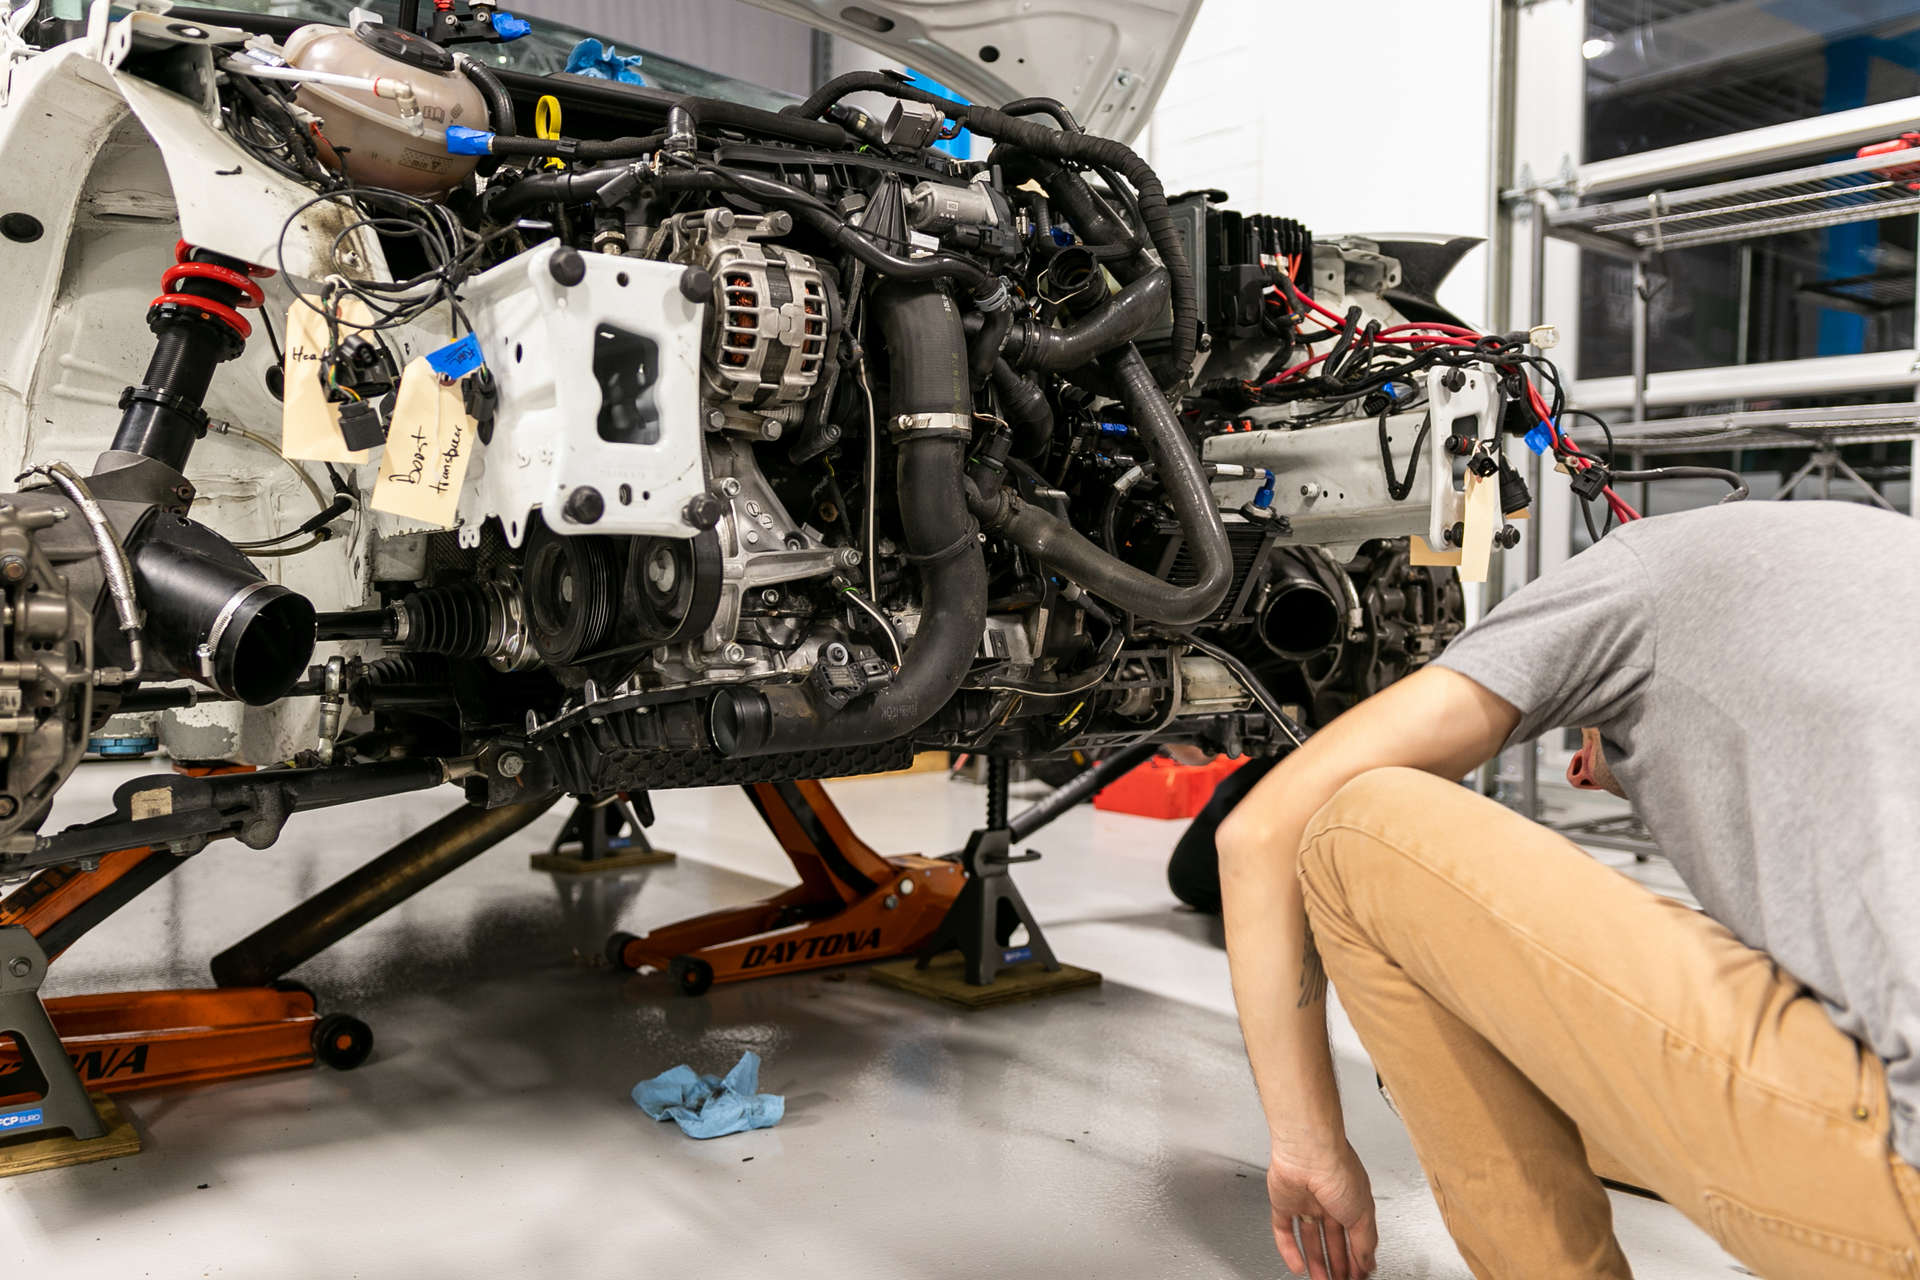 motorsport-monday-ep3-engine-removal-2